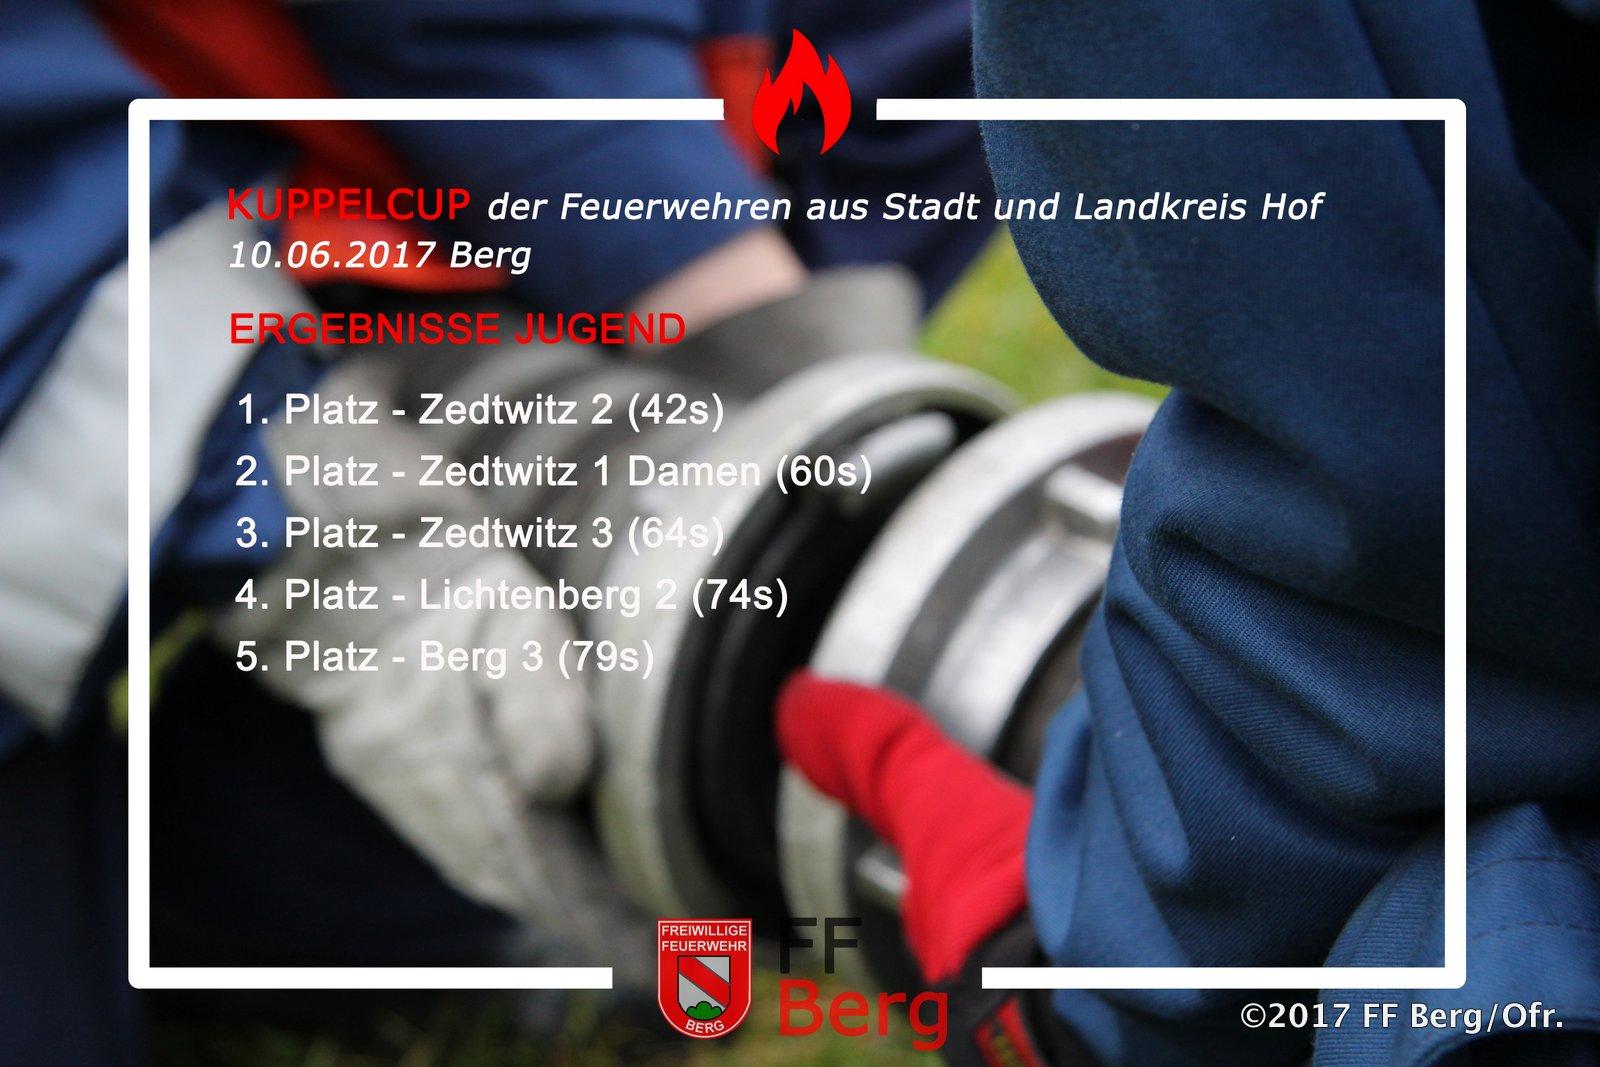 Kuppelcup_Ergebniss_Jugend_2017